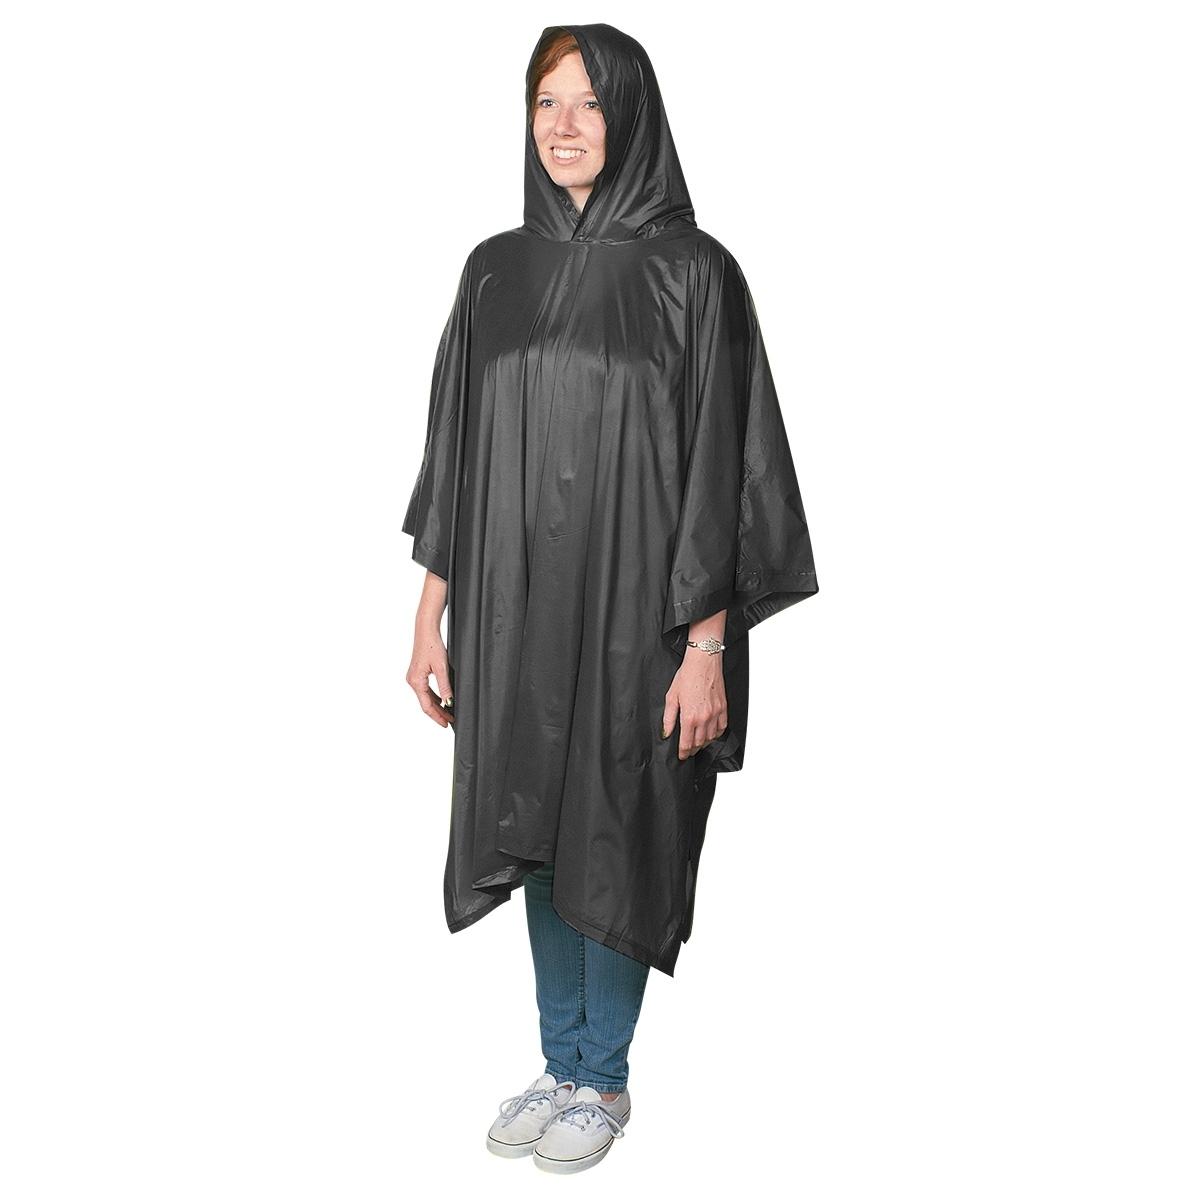 Sportster Adult Rain Poncho